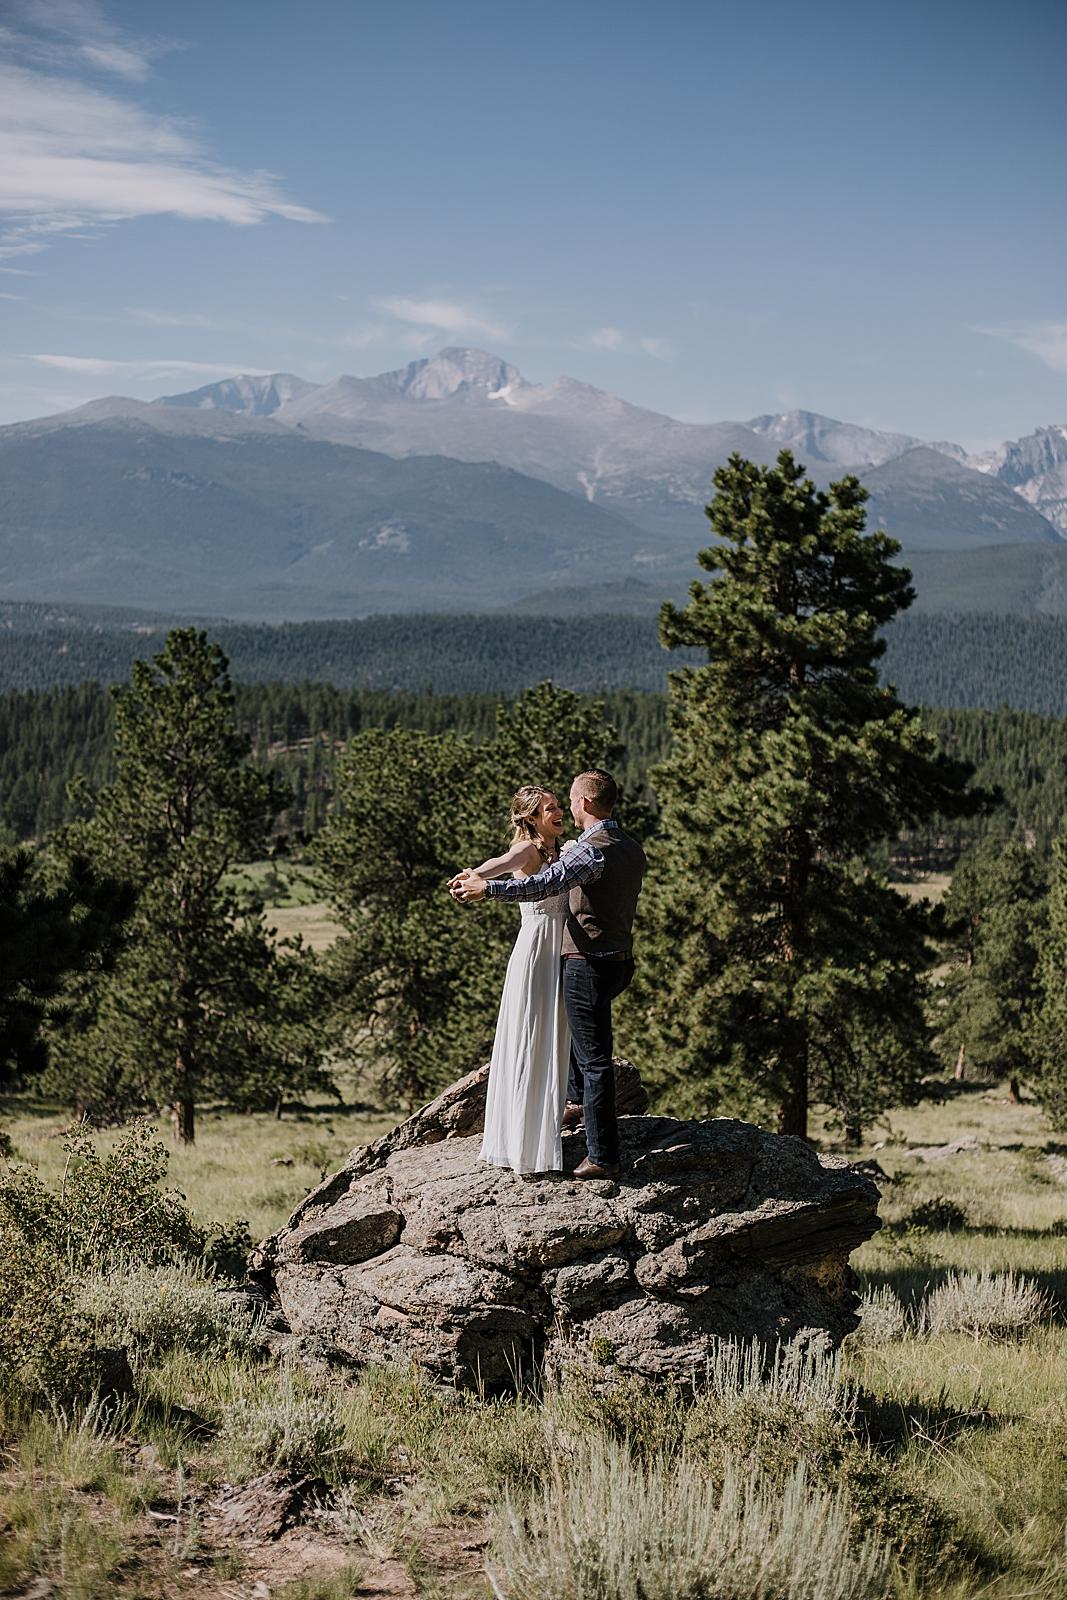 couple celebrating, RMNP elopement ceremony, rocky mountain national park elopement, 3M curves elopement, self solemnizing, self solemnization, long's peak, hiking elopement, estes park elopement